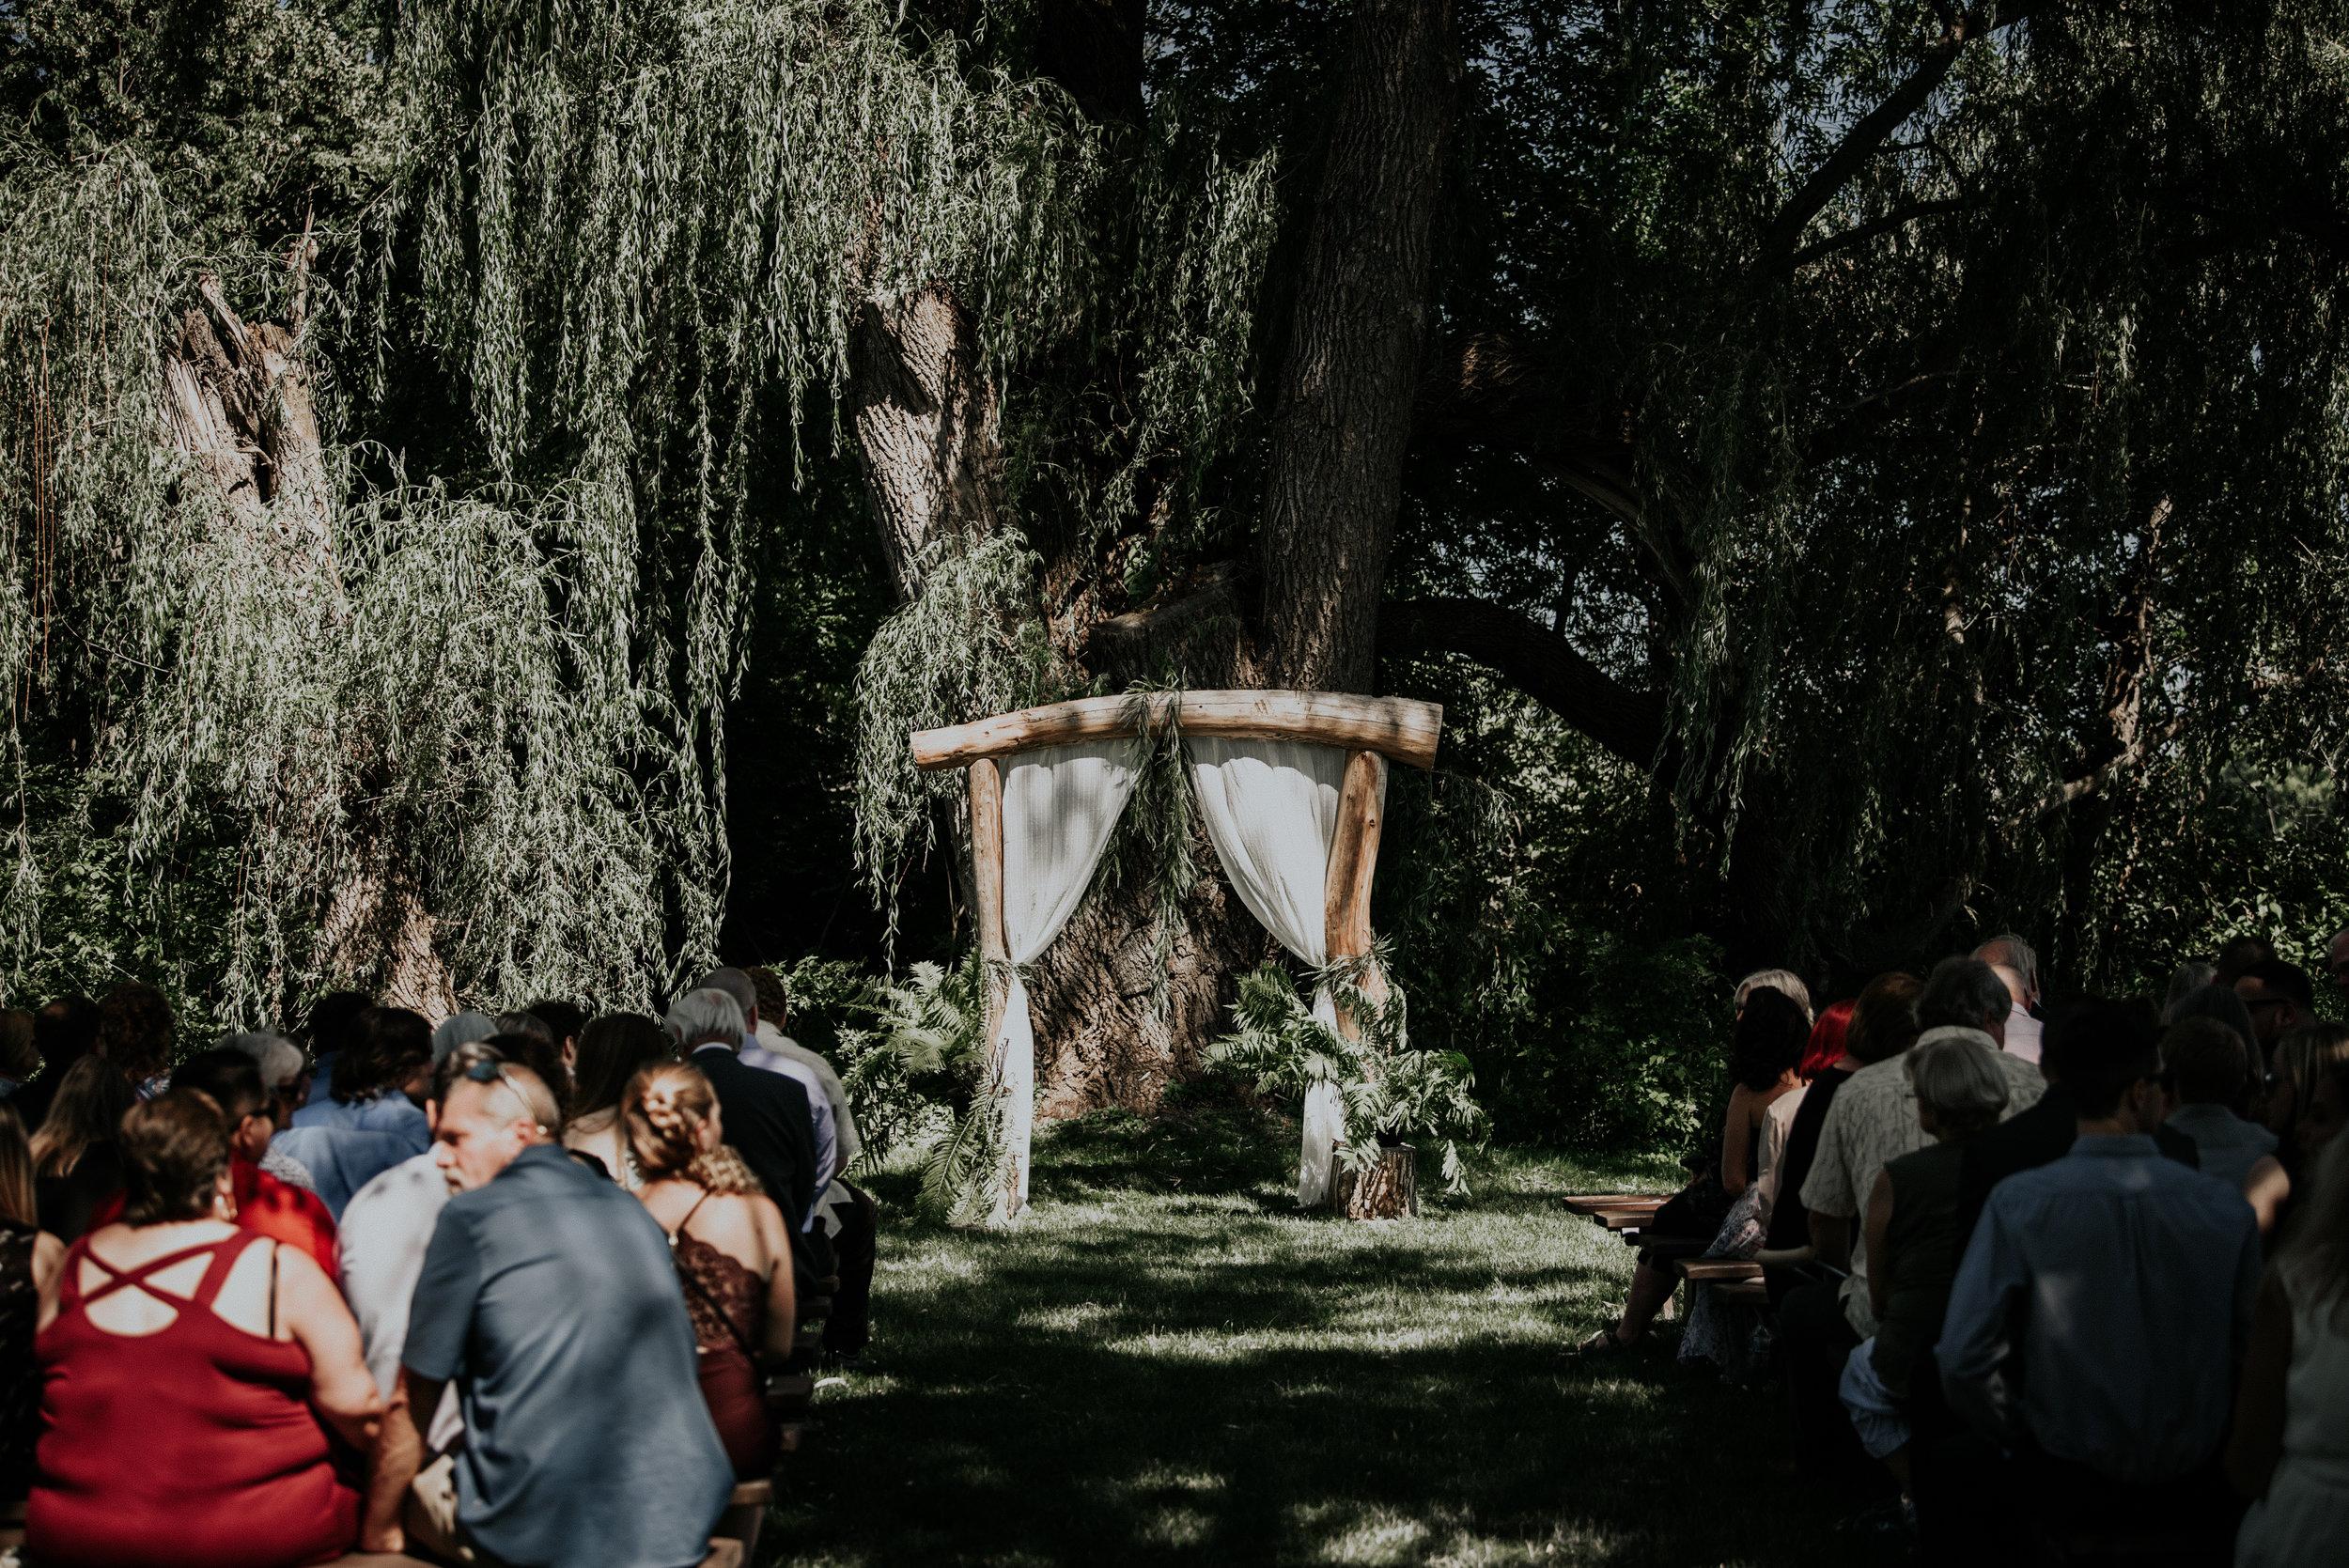 BridesbyYoung-RealWedding-PlusSizeBridal-BillyCourtney-JurassicParkTheme-21.jpg